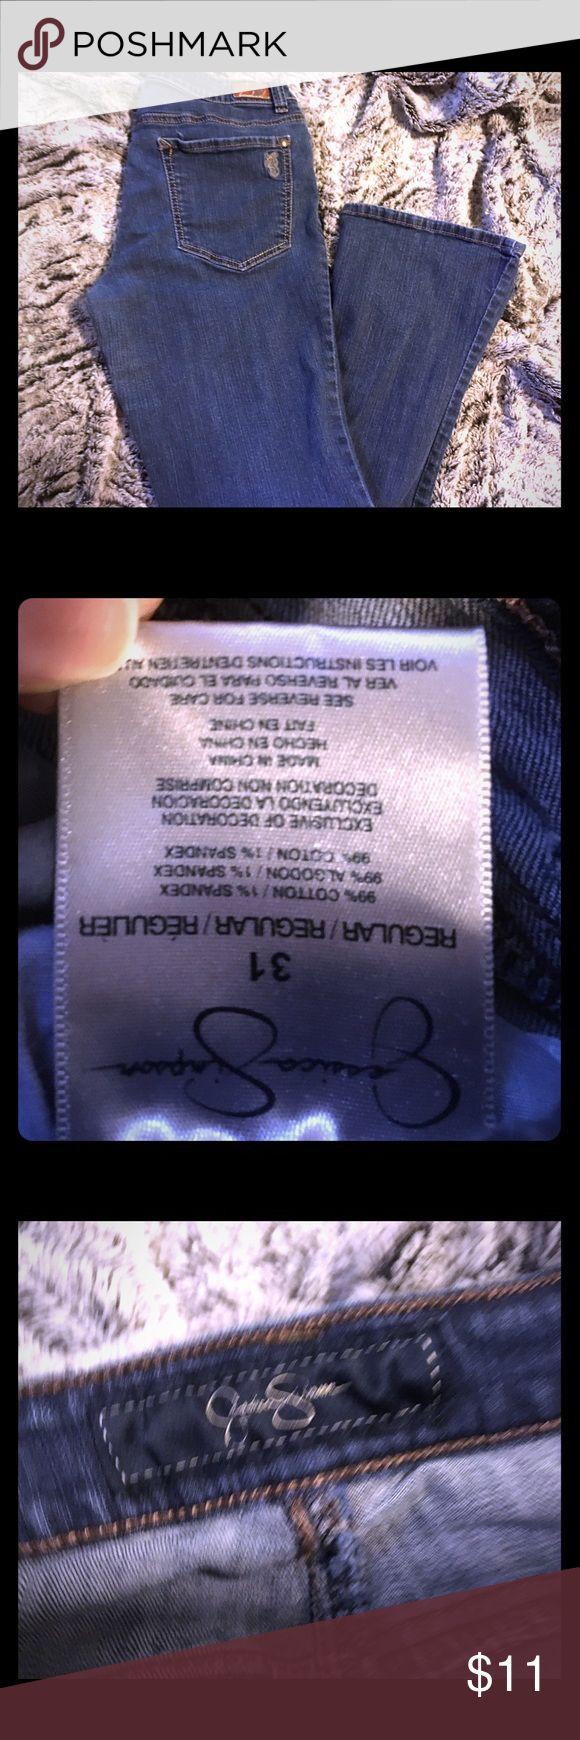 Jessica Simpson palisades Demi flare jeans Size 31 gently loved Jessica Simpson jeans Jessica Simpson Jeans Flare & Wide Leg